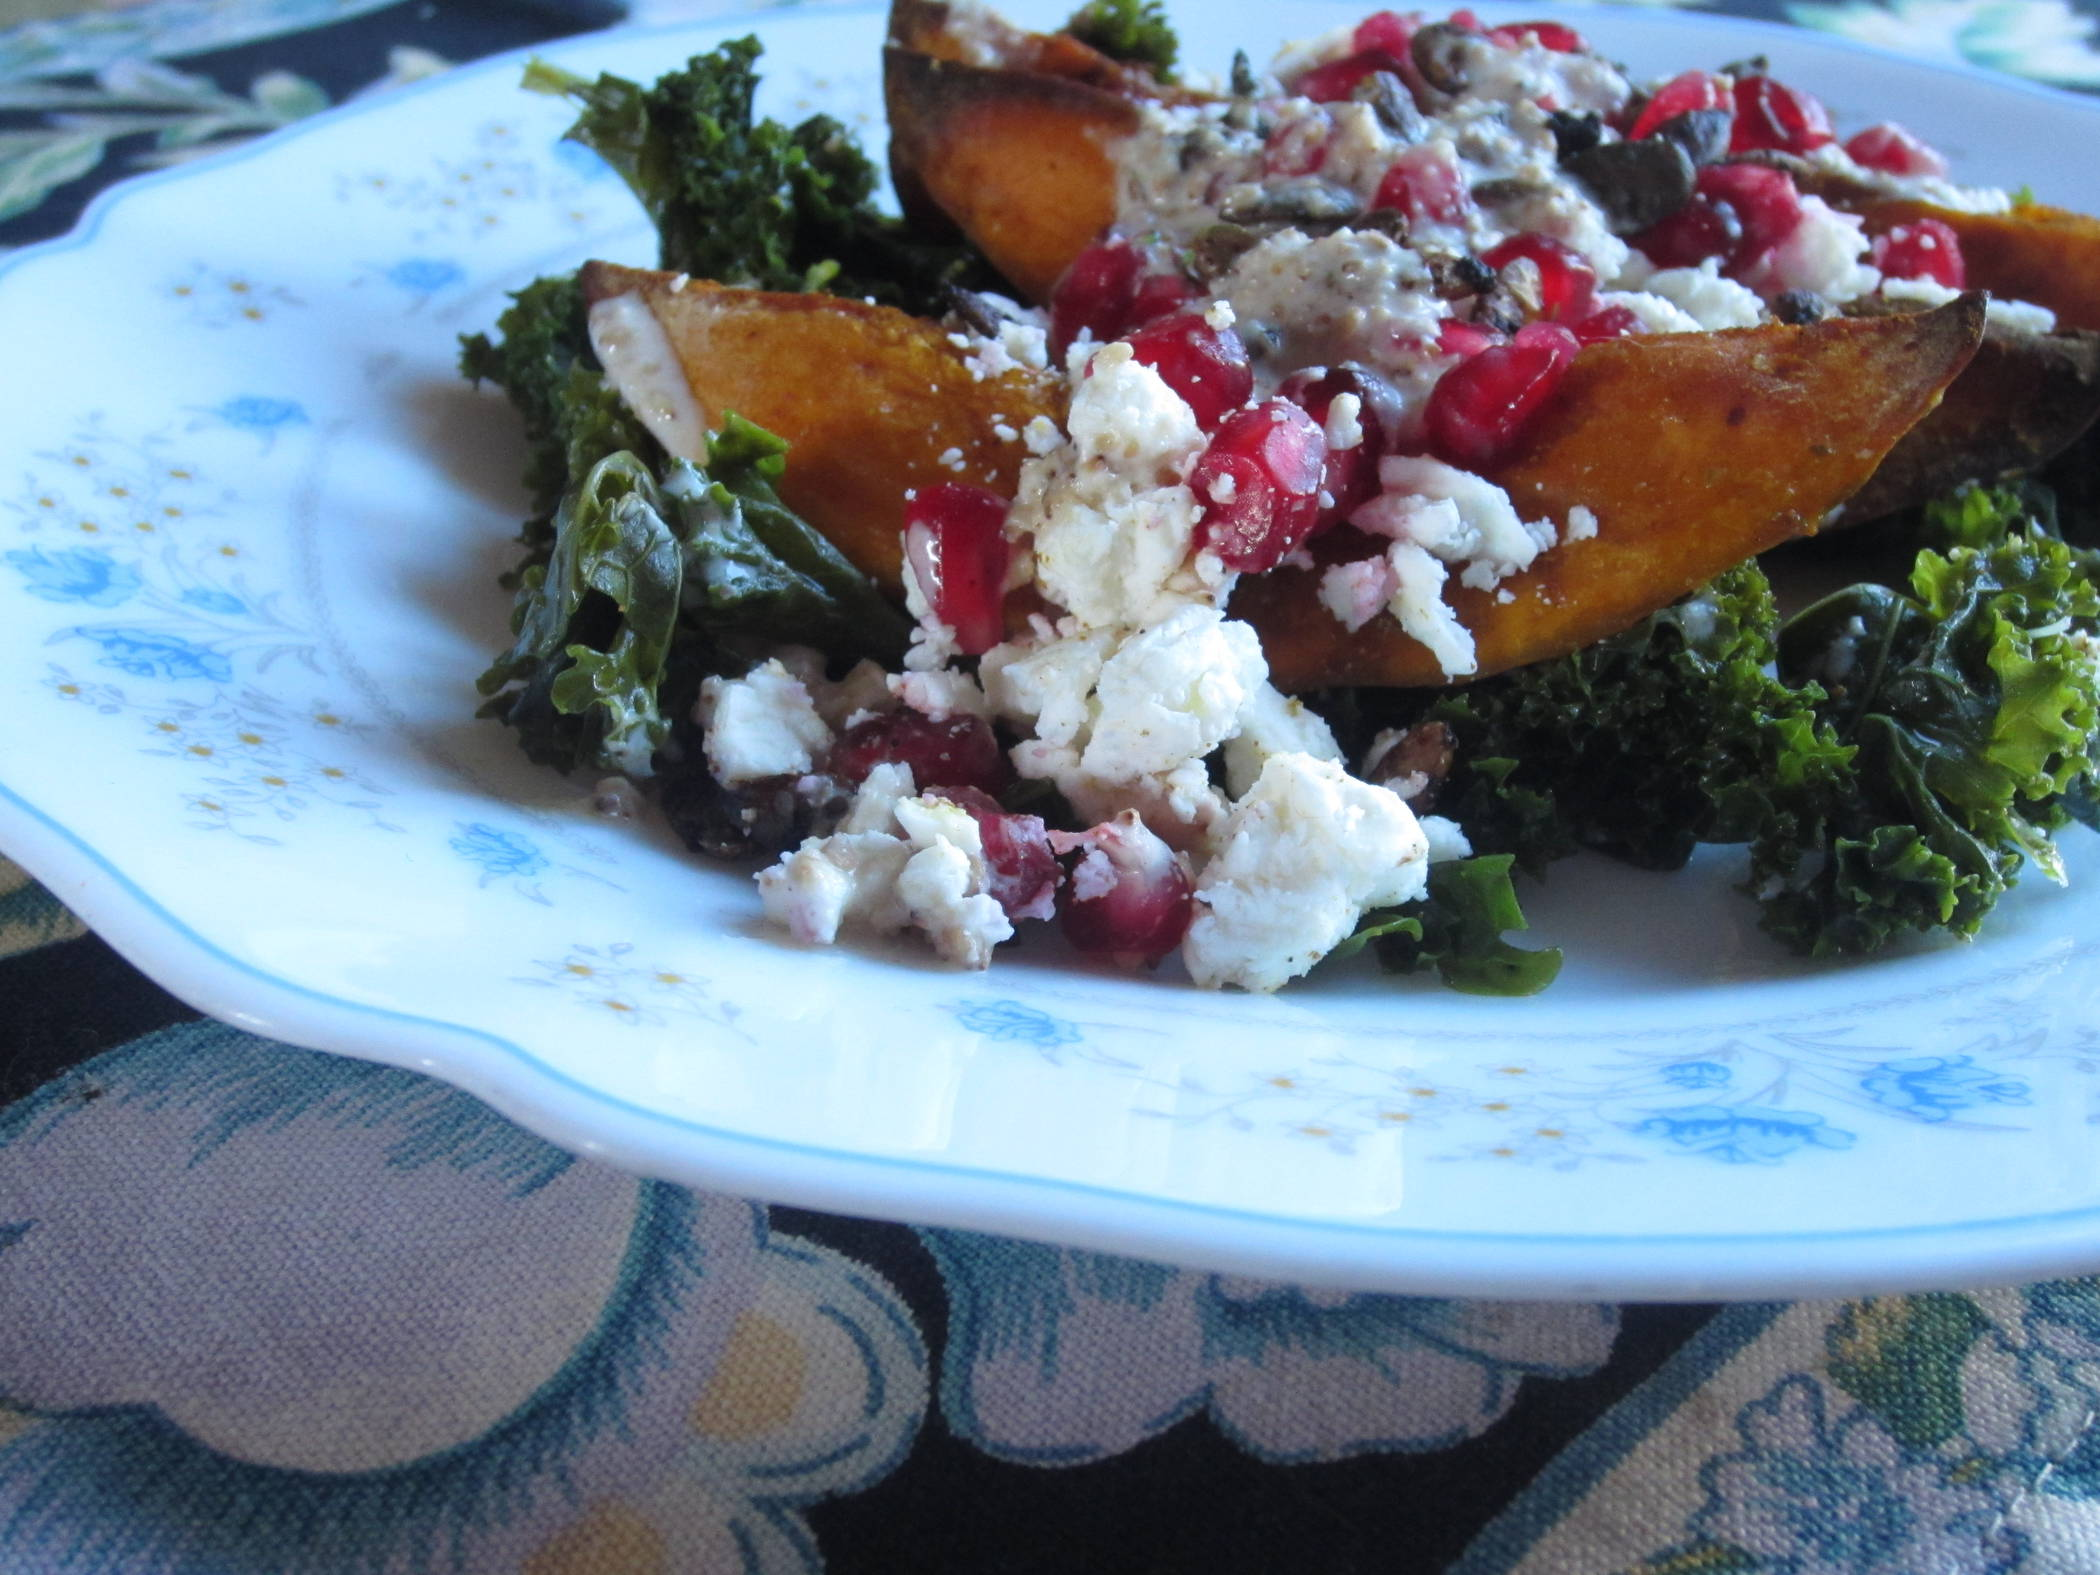 Squash, Feta and Pomegranate with Kale